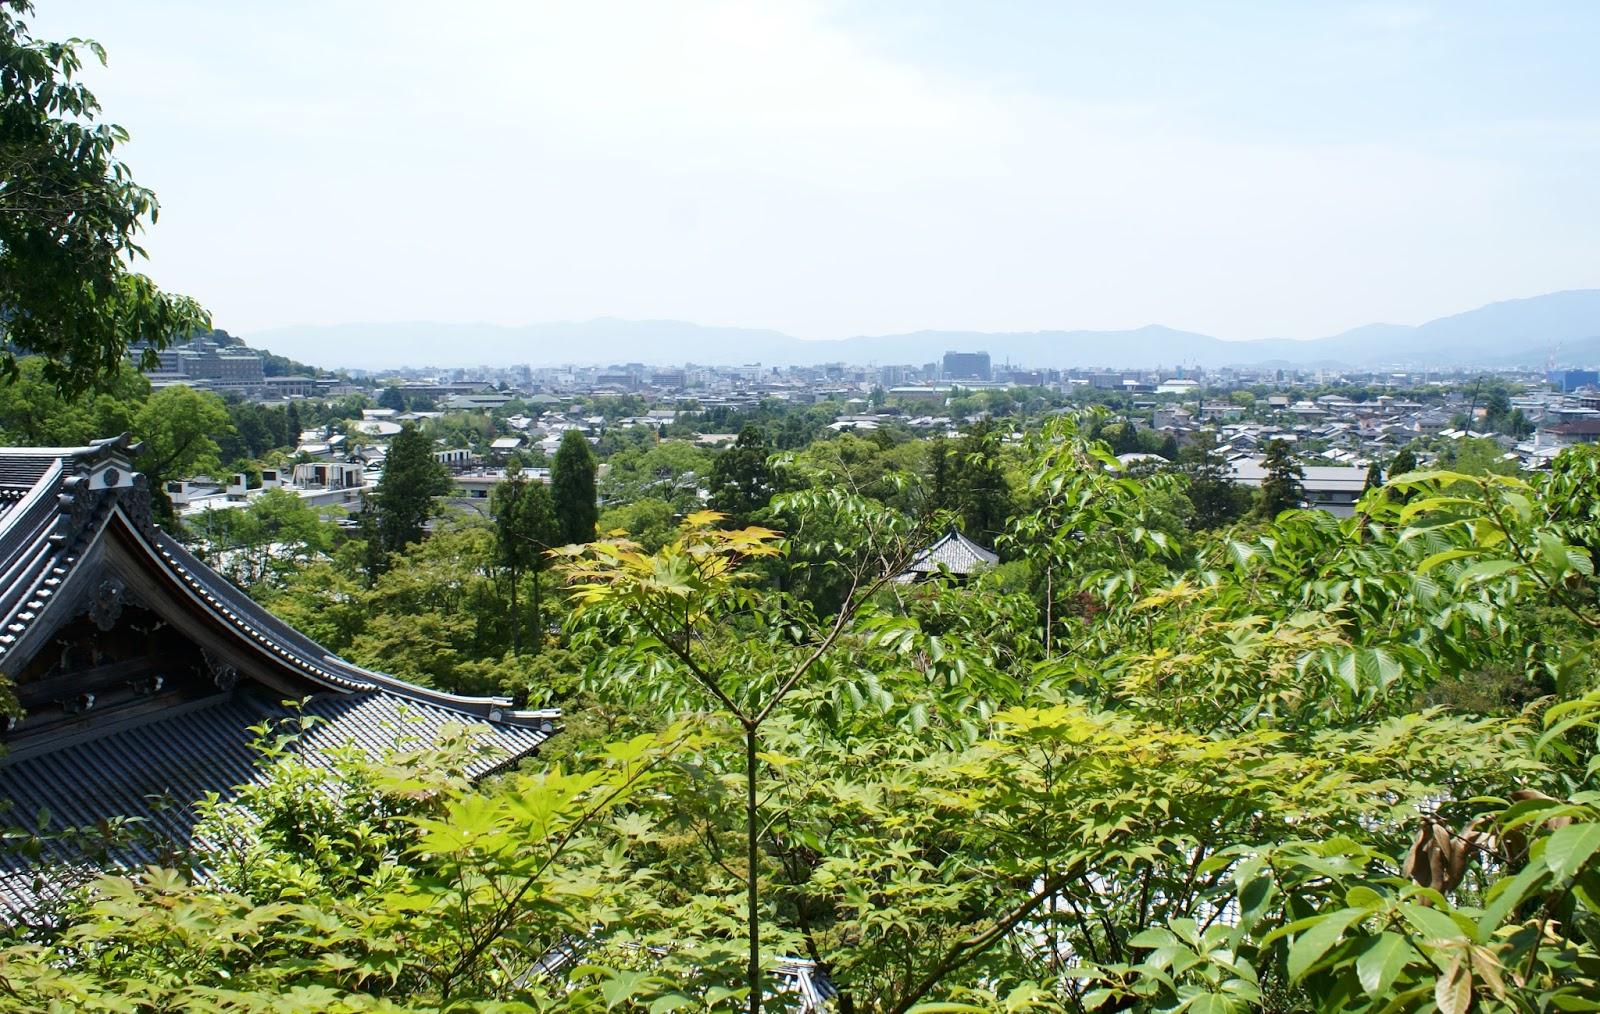 eikan do zenrin-ji buddhist temple garden kyoto view japan